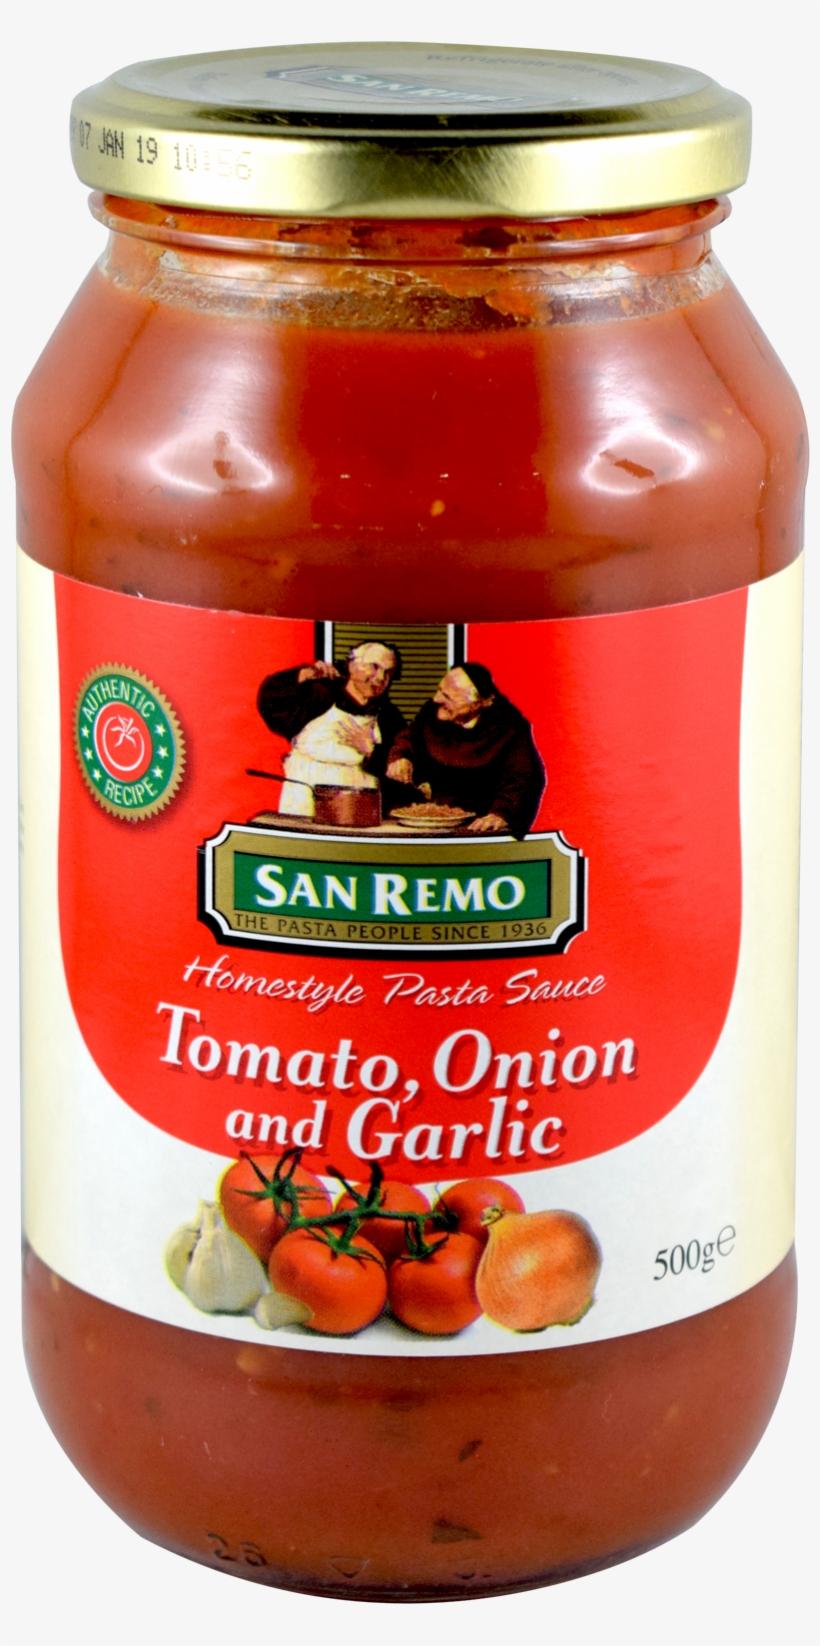 Graphic Library Download San Remo Tomato Onion Garlic - San Remo Pasta Sauce, transparent png #1003190